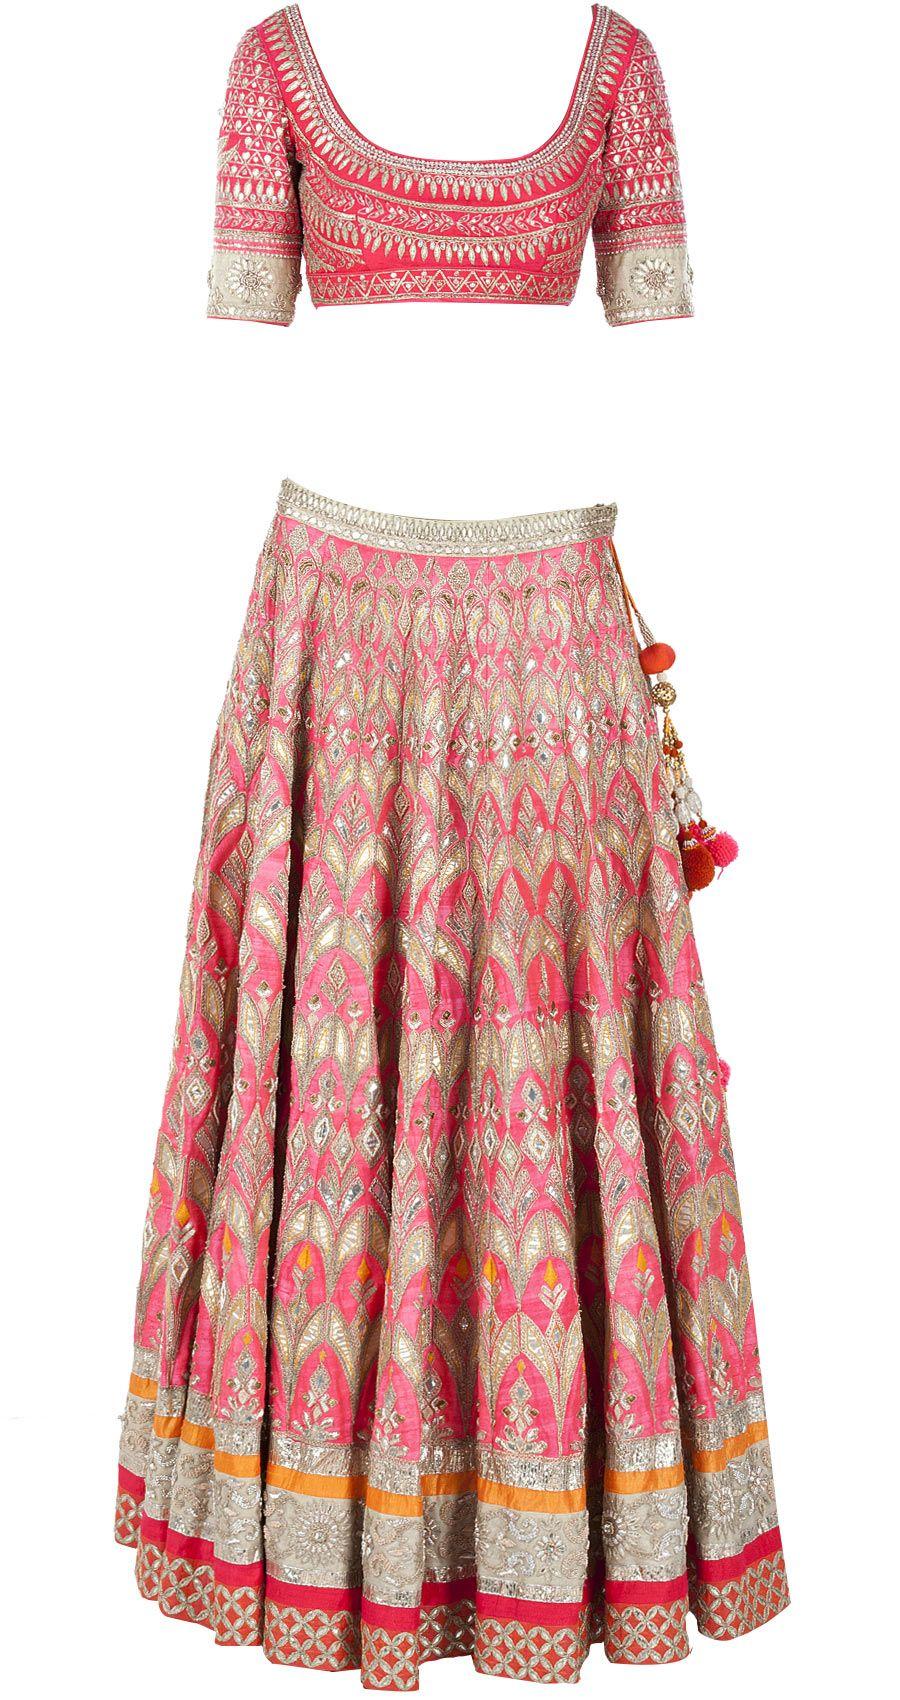 Pin de Ansuya Patel en bollywood fashion | Pinterest | India ...